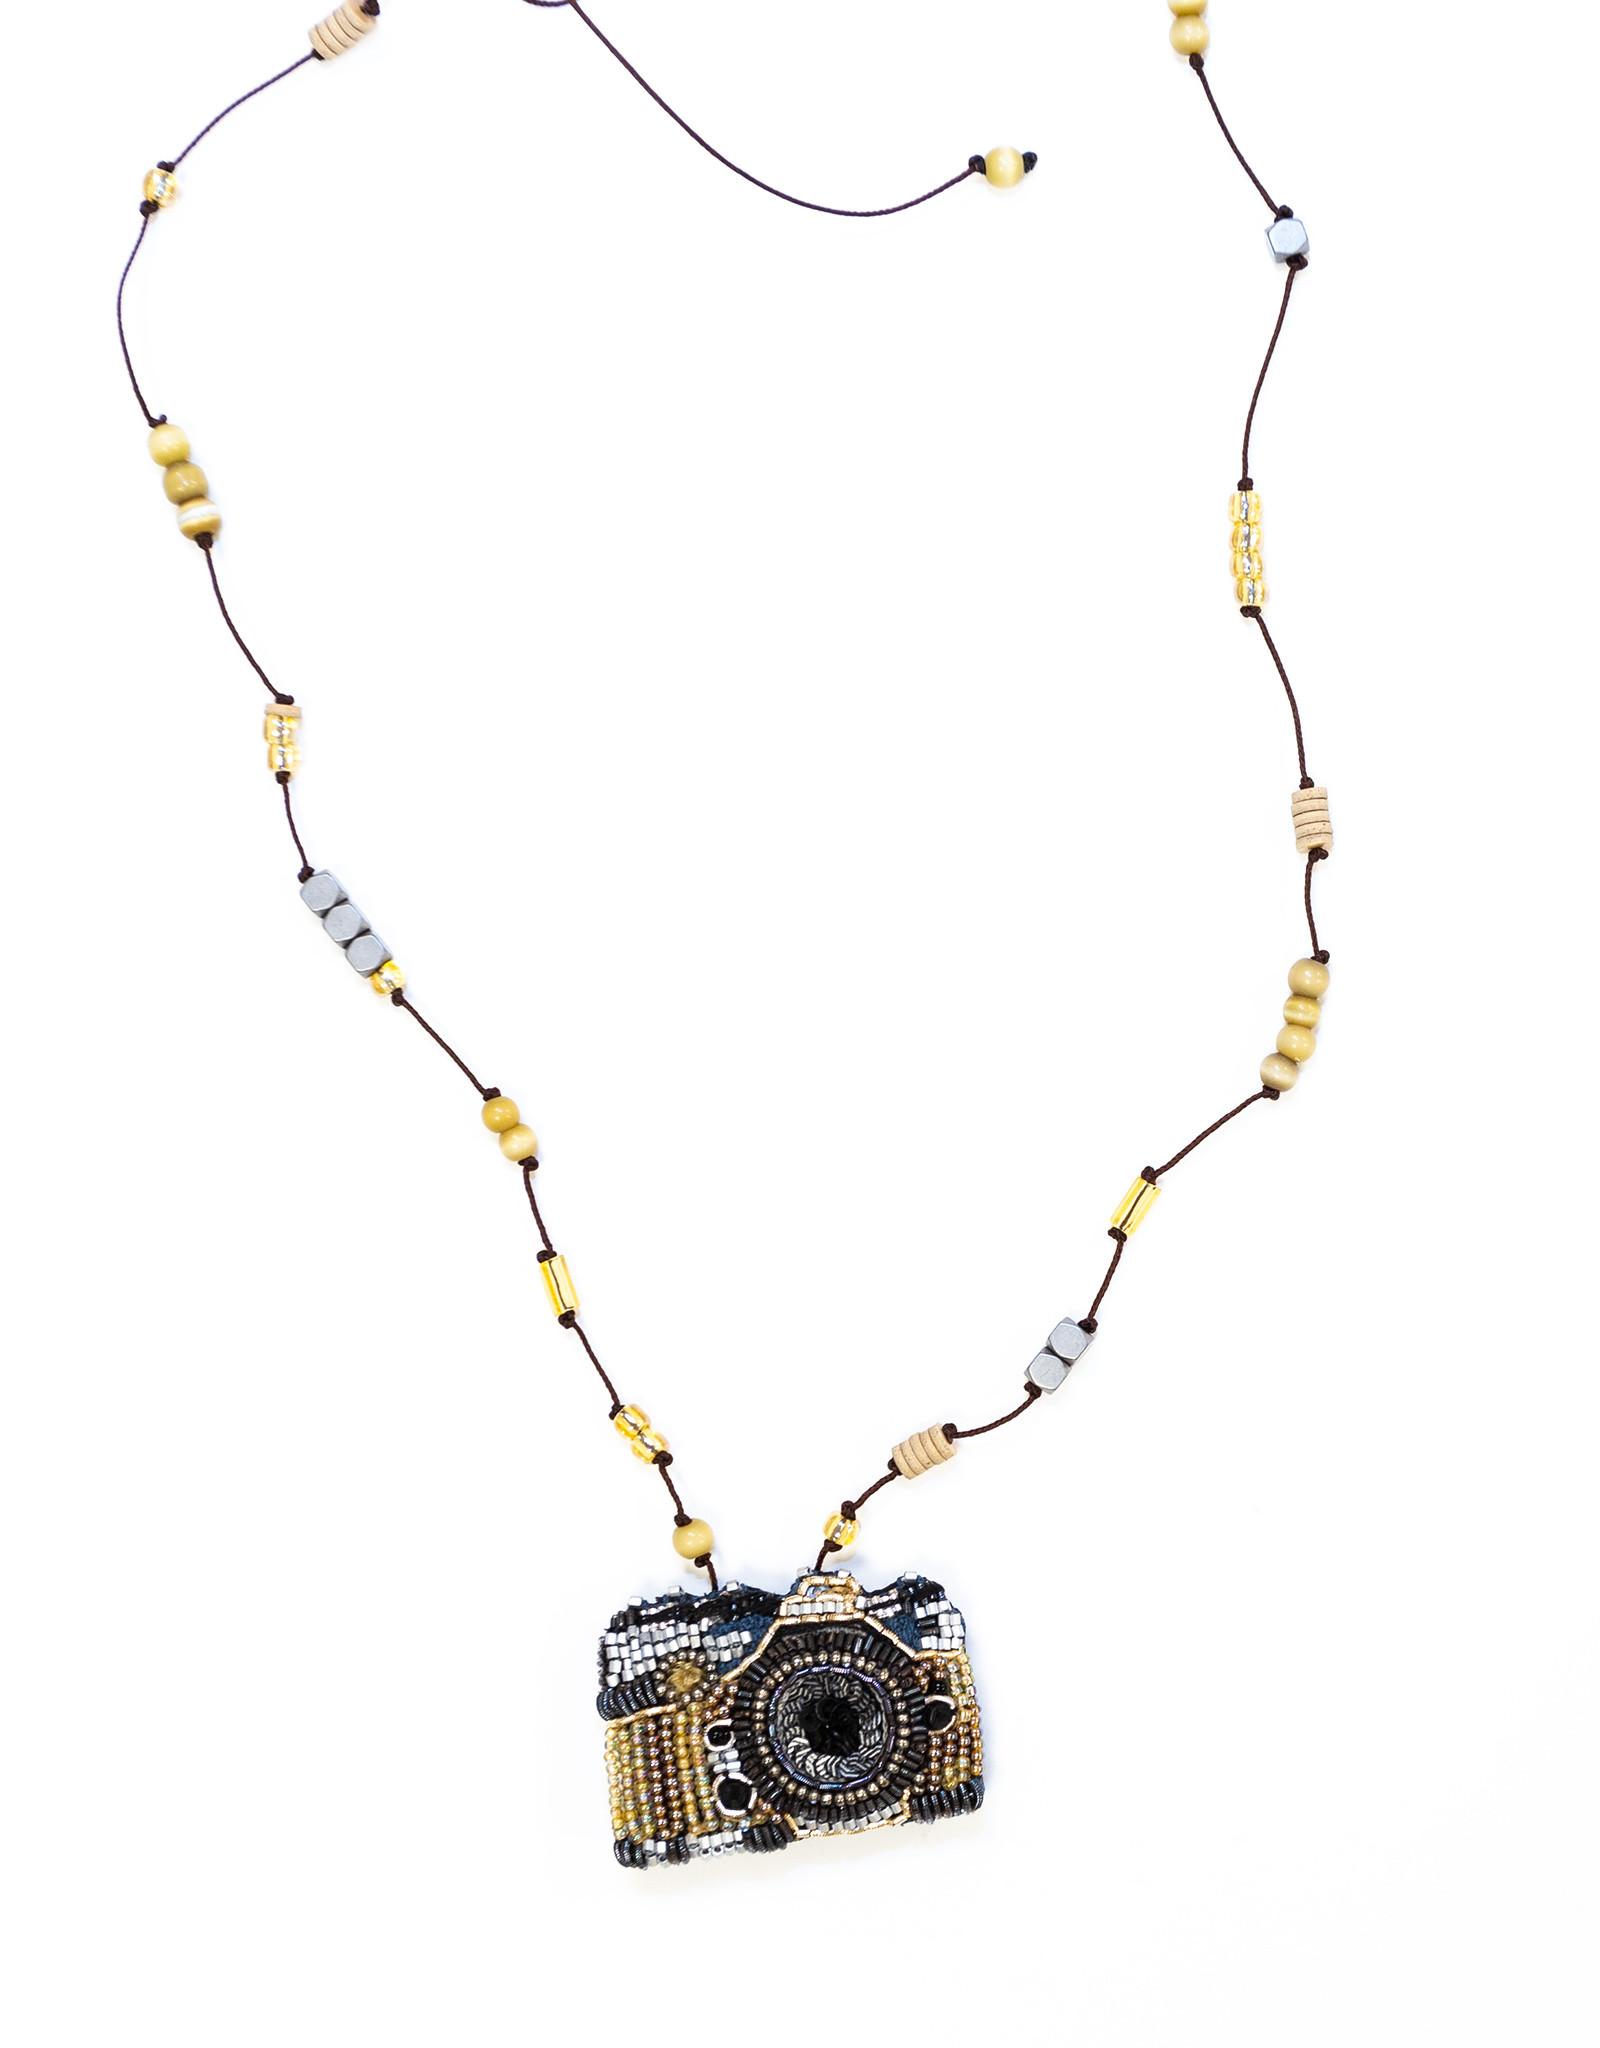 Beaded Camera Necklace